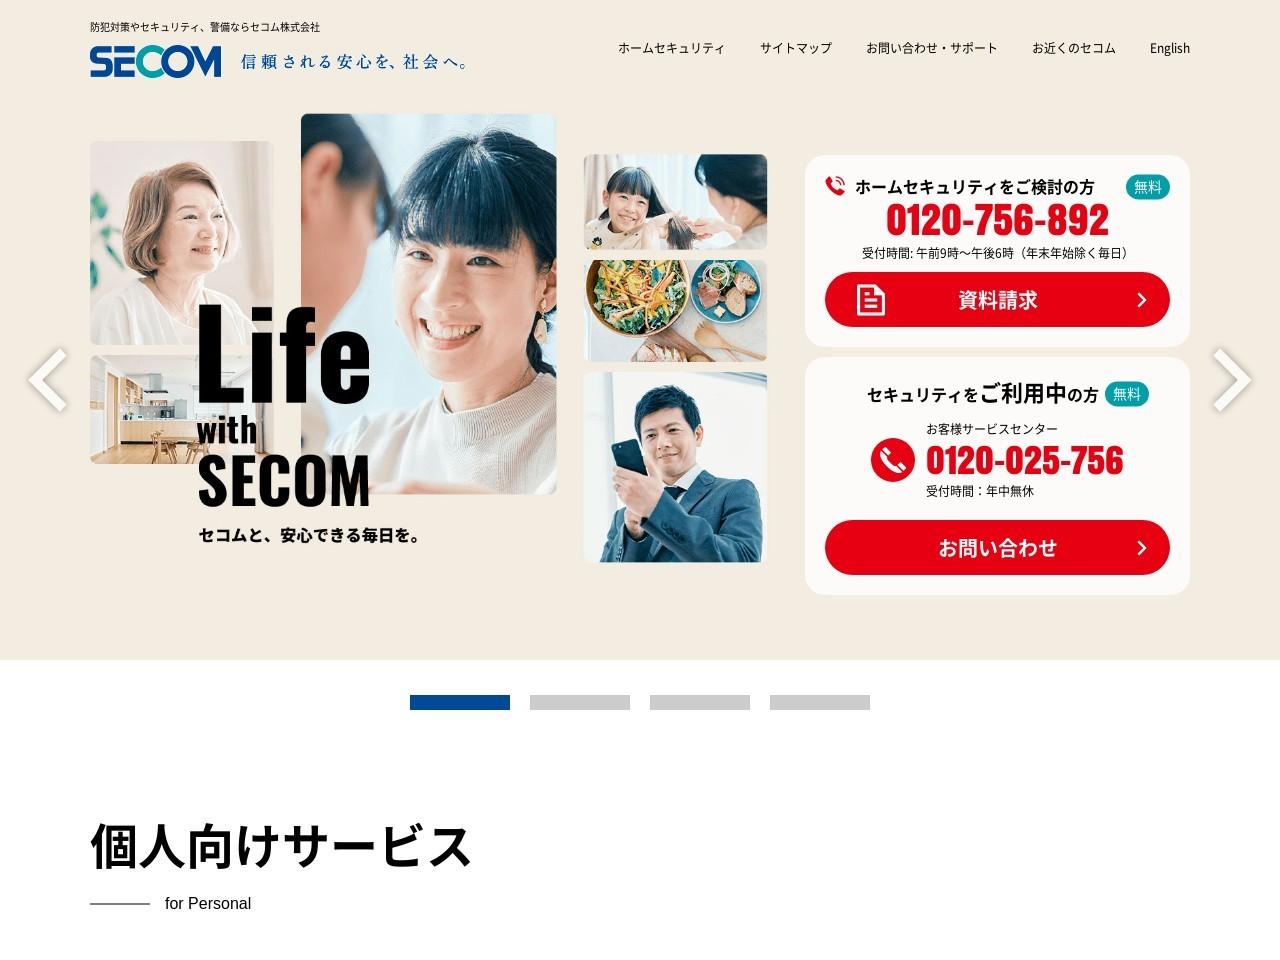 http://www.secom.co.jp/business/medical/index/